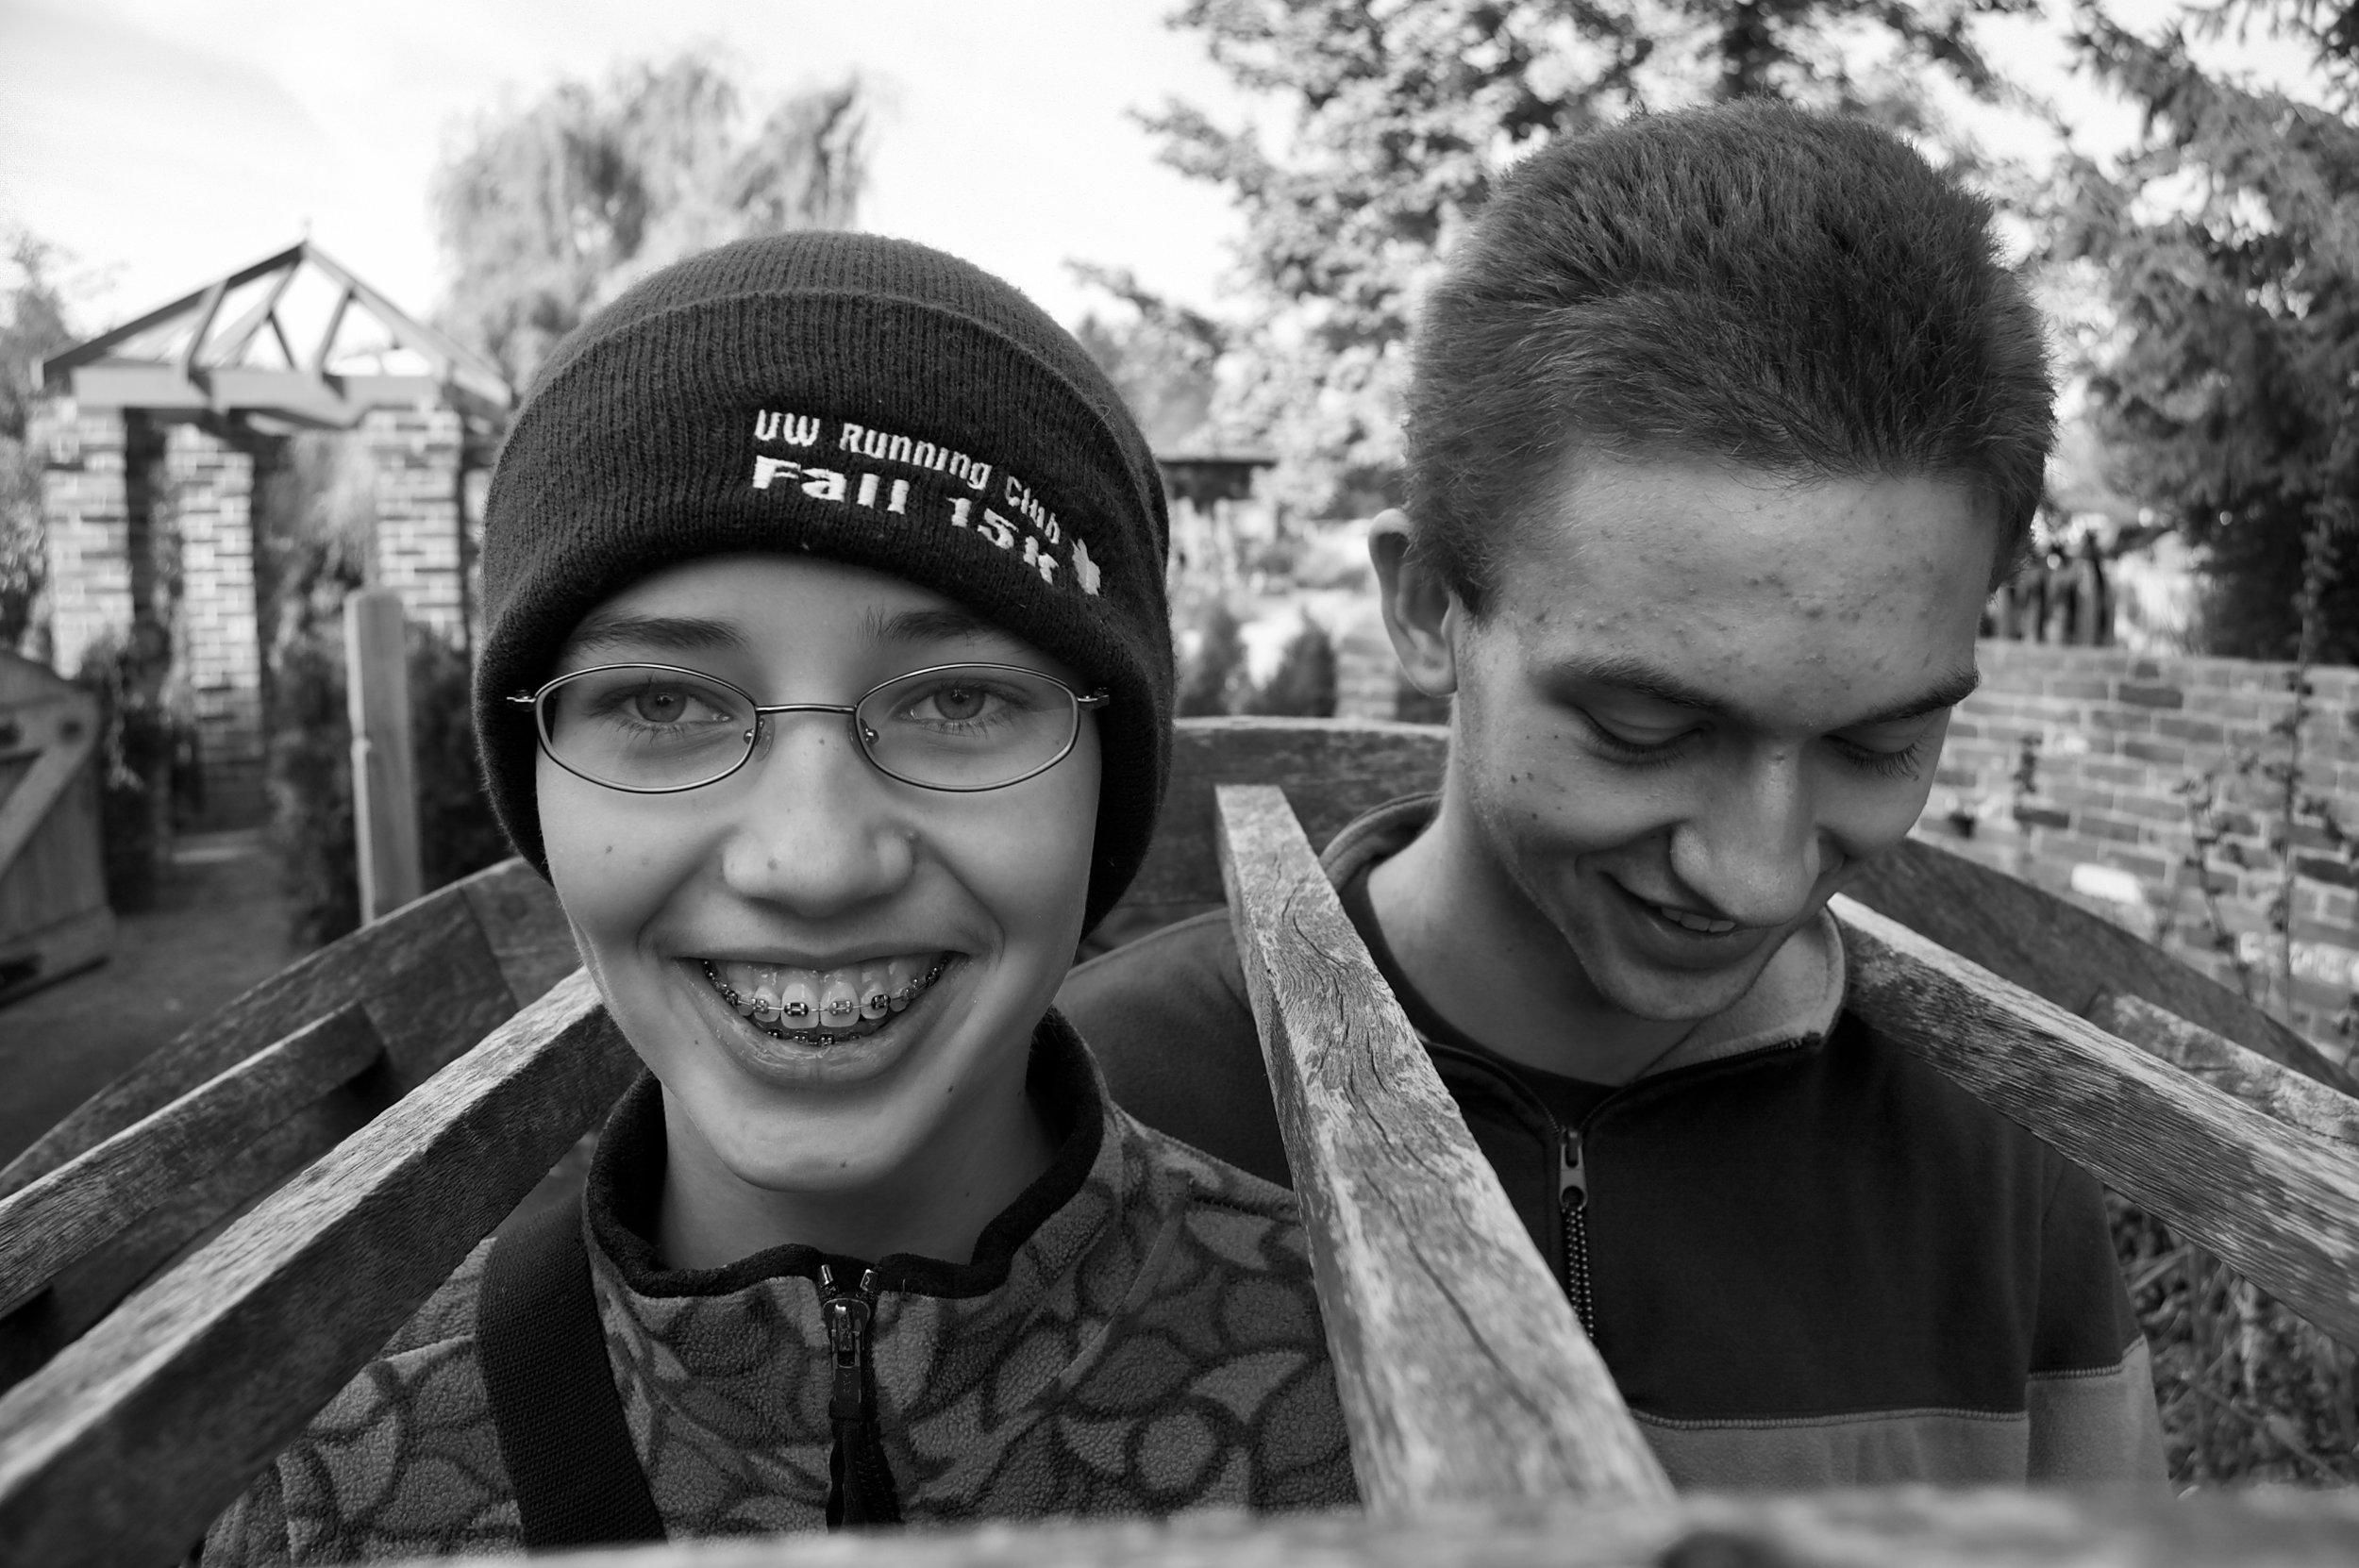 Trellis. 4-H Childrens Garden. East Lansing, Michigan. November 2008. © William D. Walker